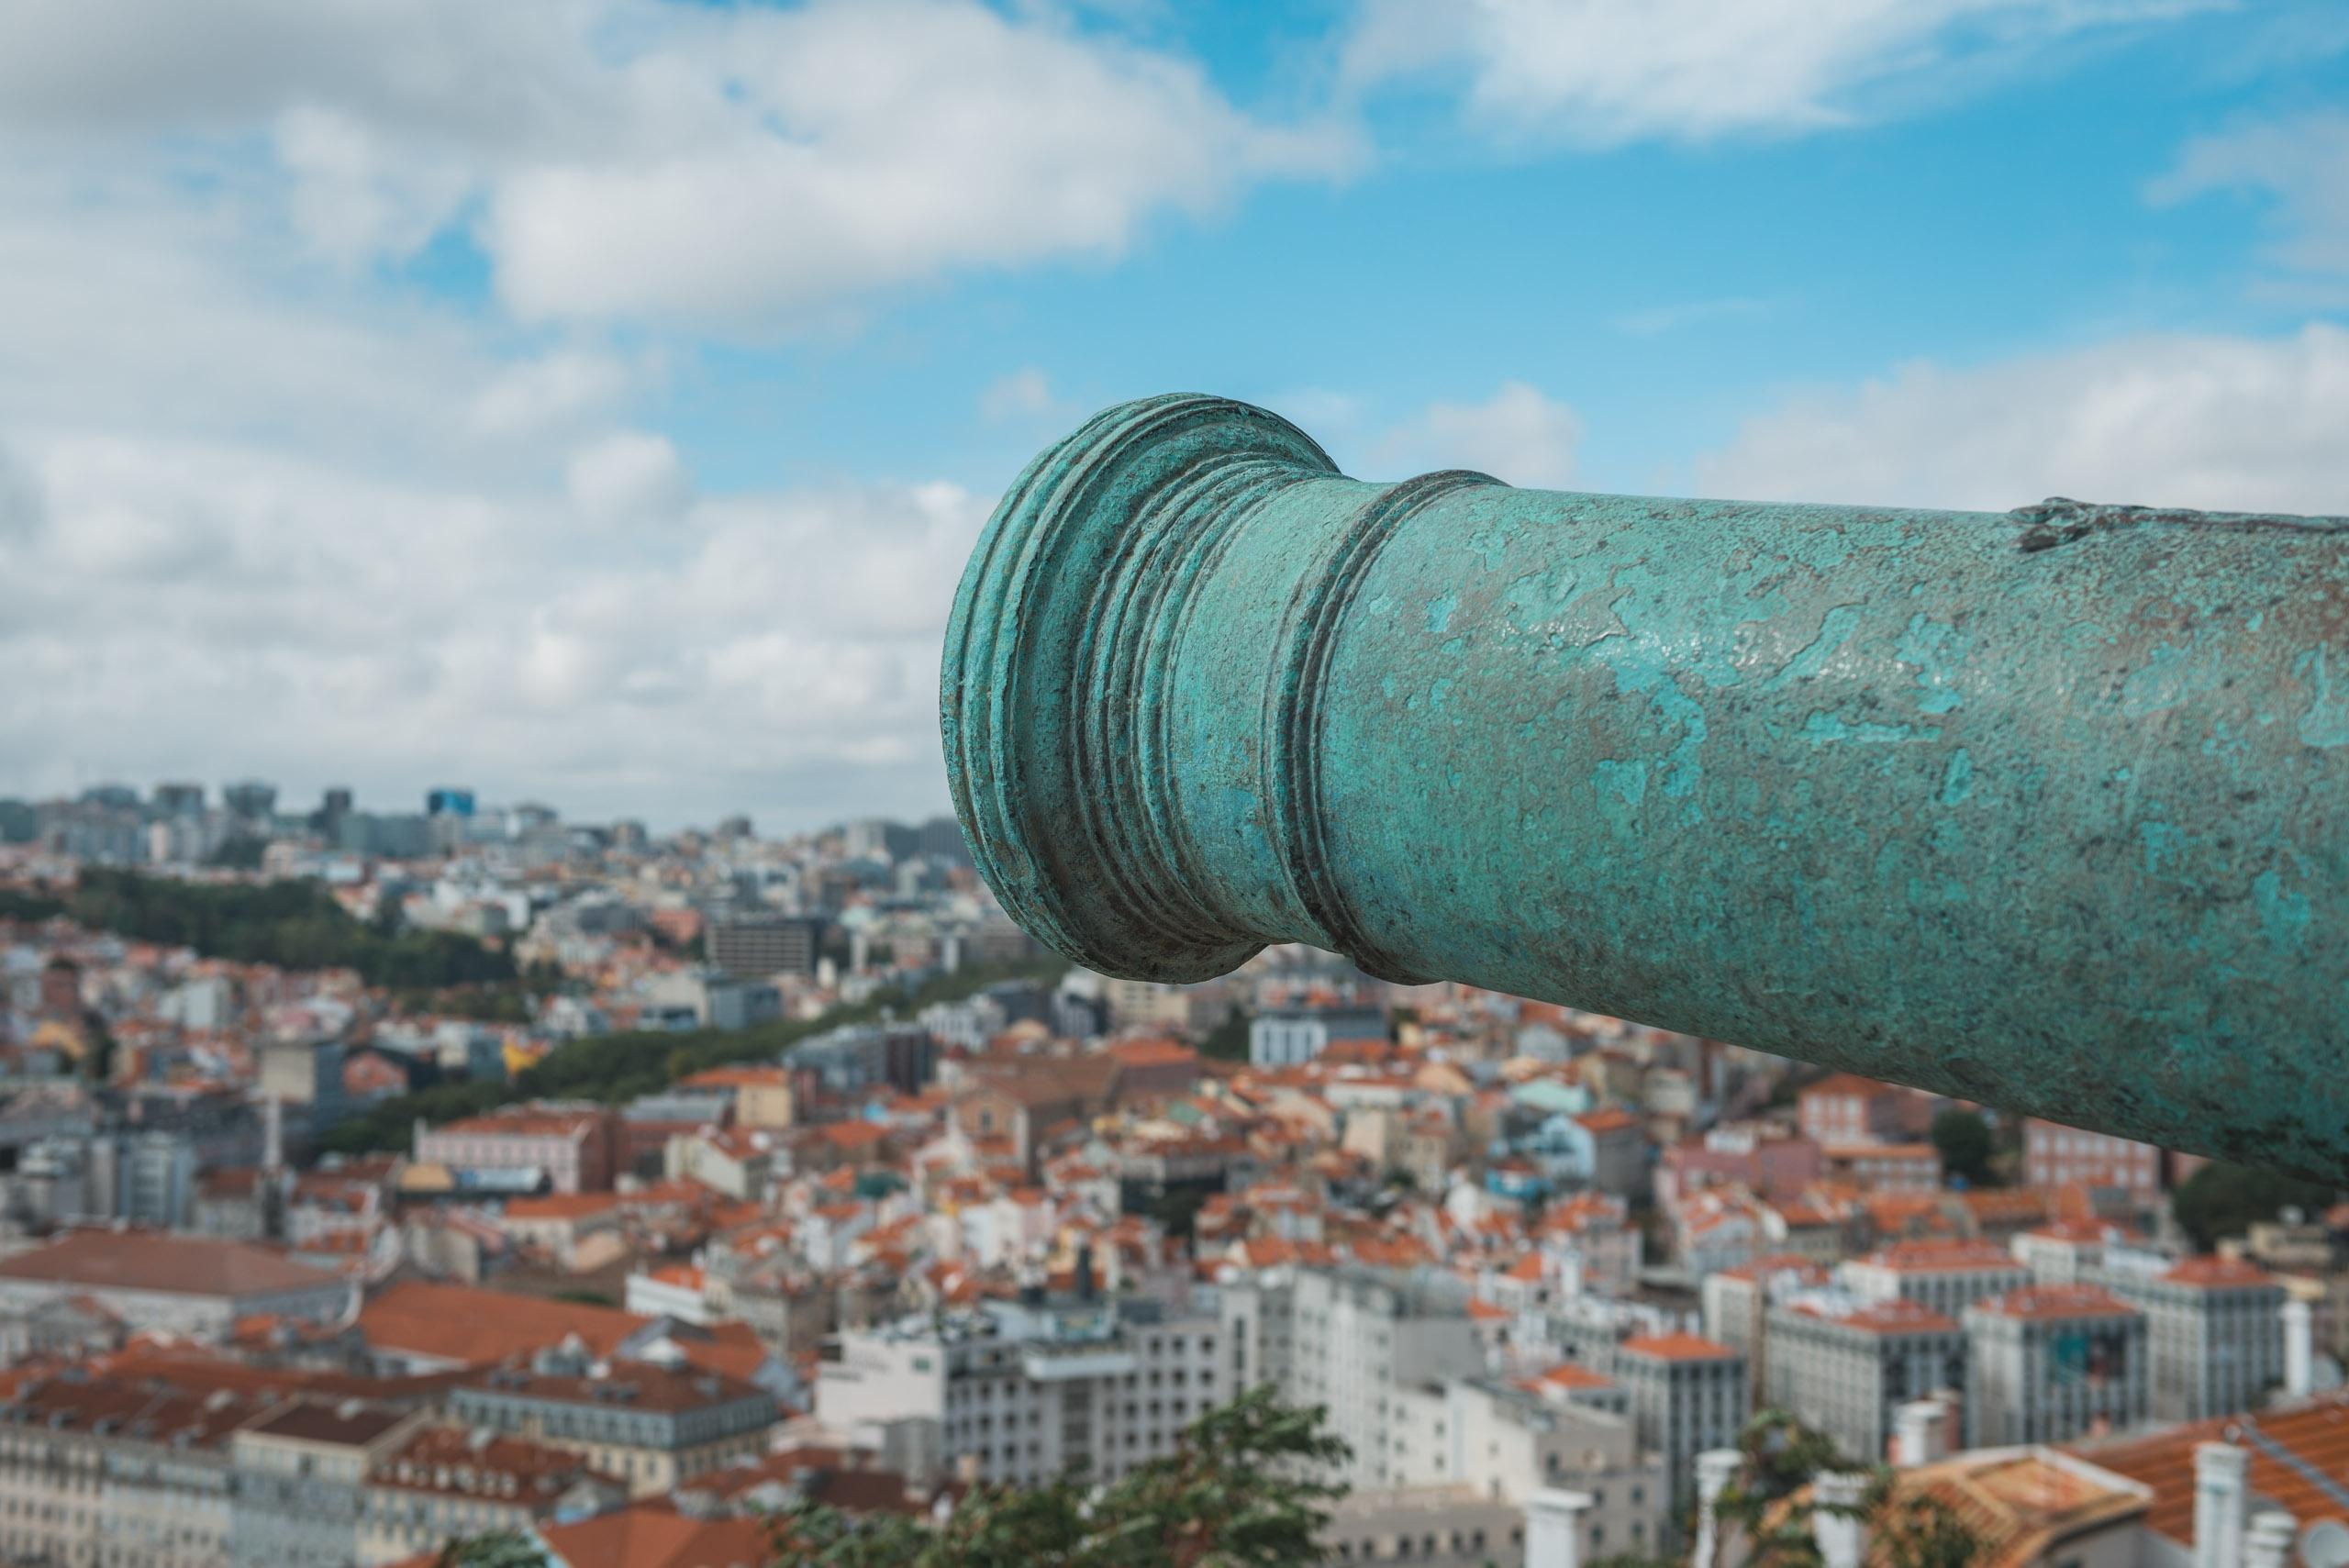 Portugal - Lisbon - 2012-0921-DSC_1421_59756